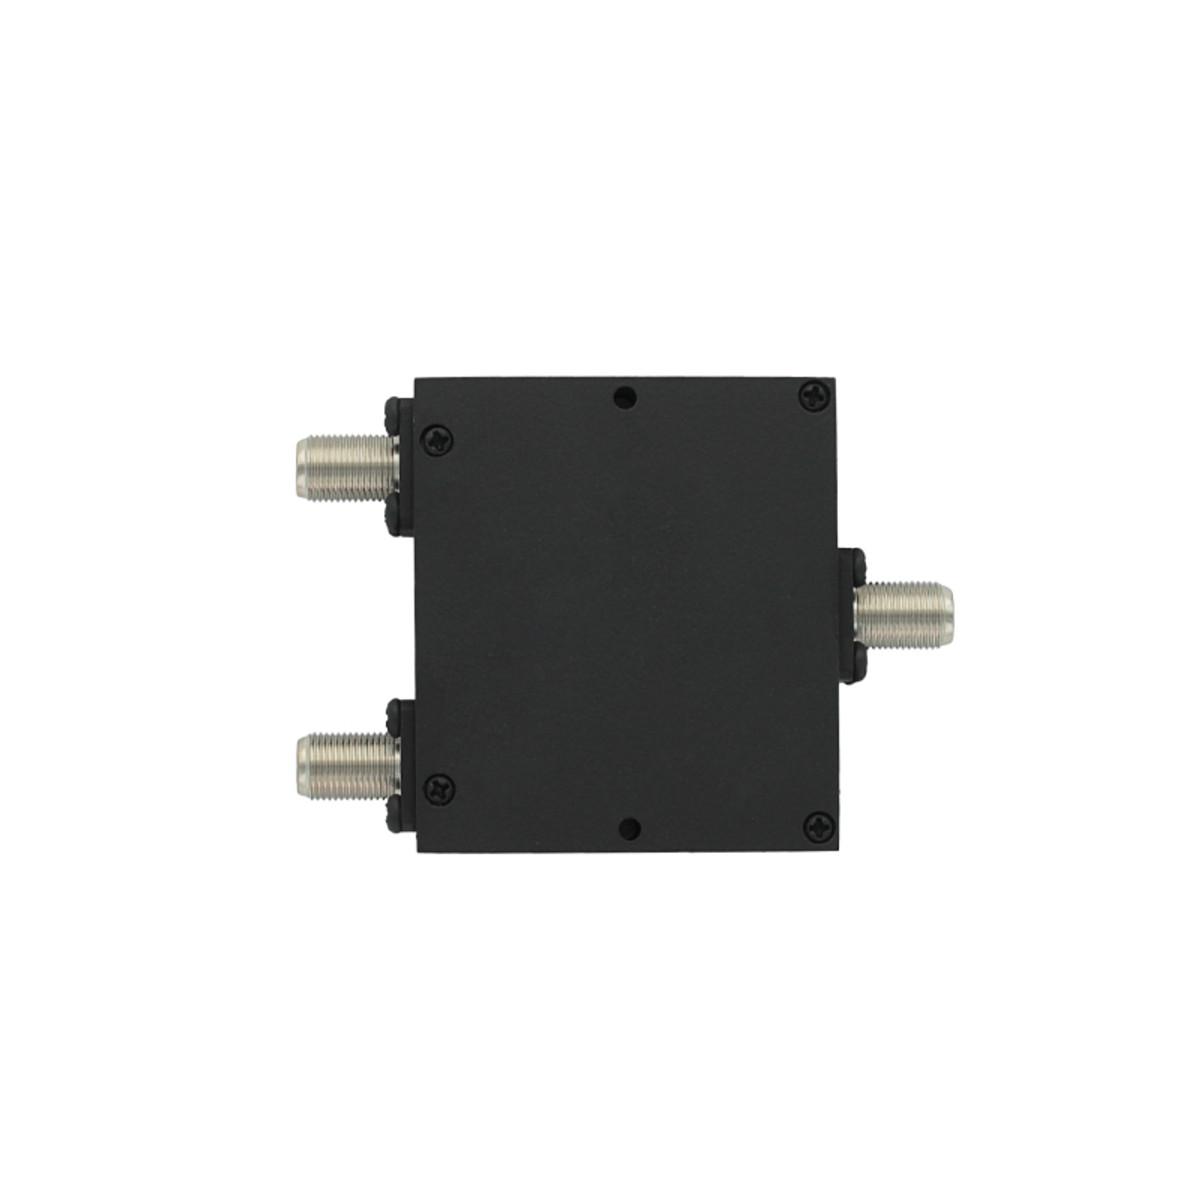 Wilson 859993 -3 dB Splitter 75ohm Wide Band 700-2500 Mhz, Back